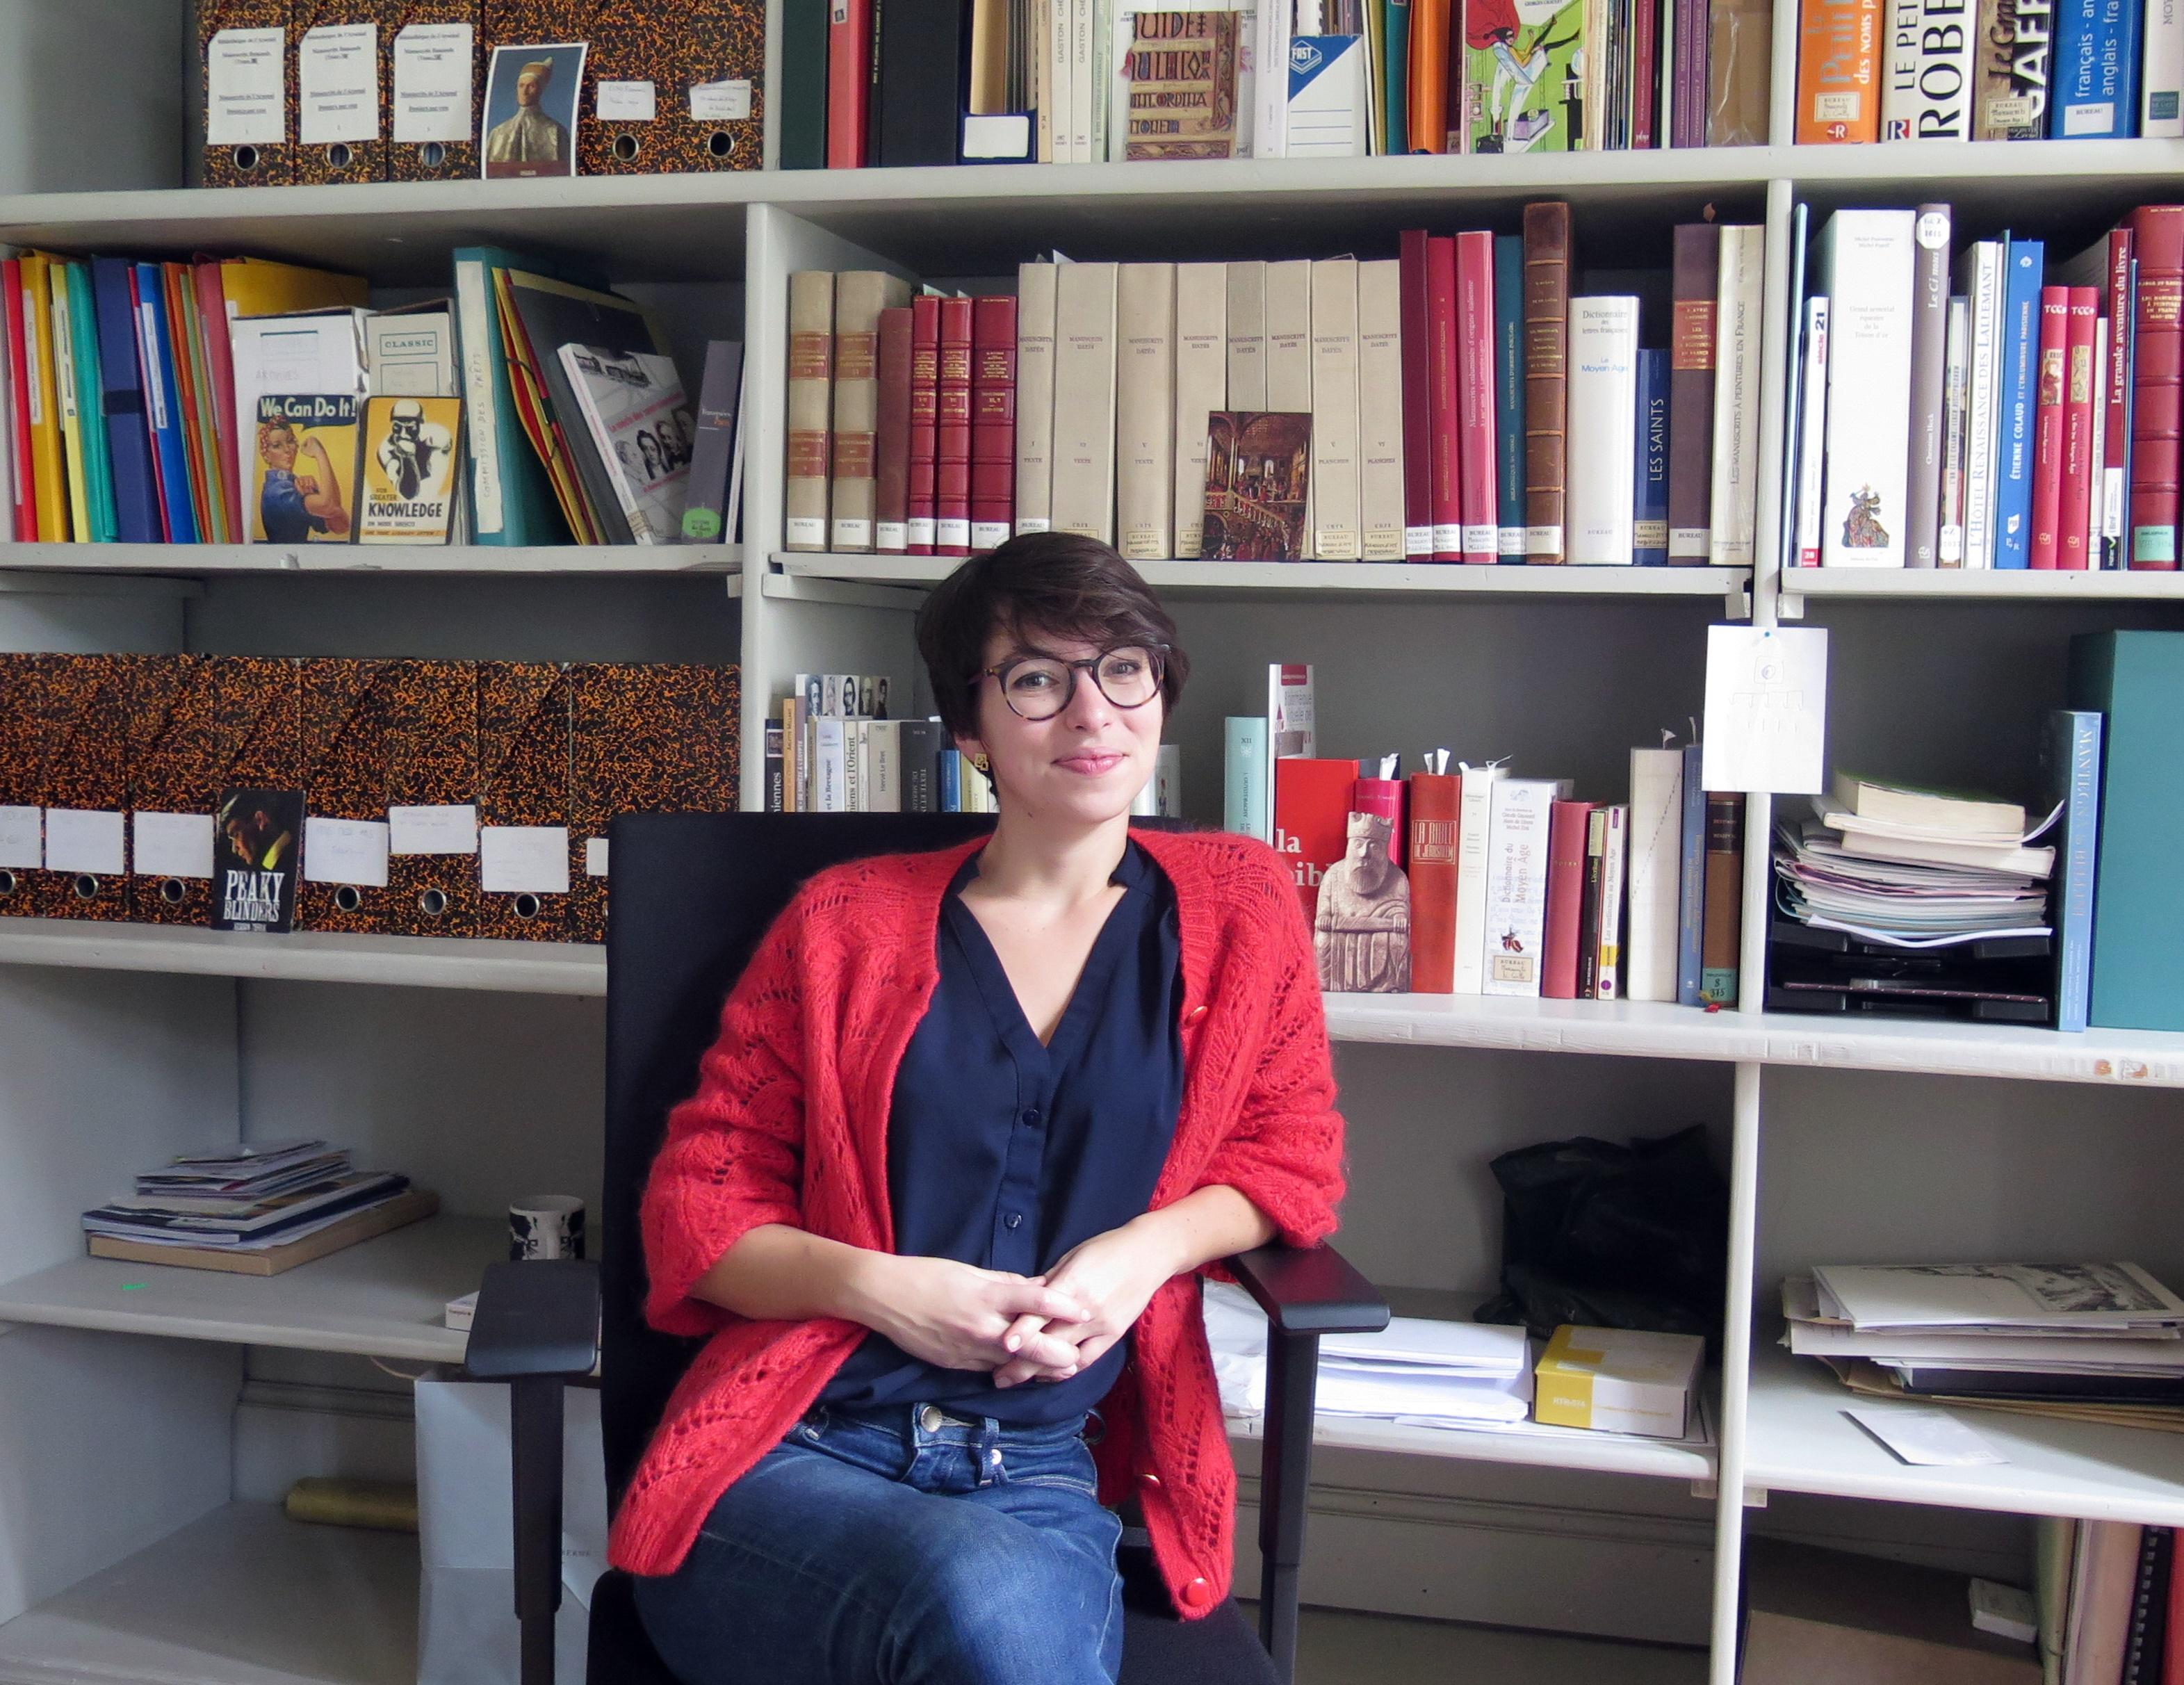 Louisa Torres à la Bibliothèque de l'Arsenal